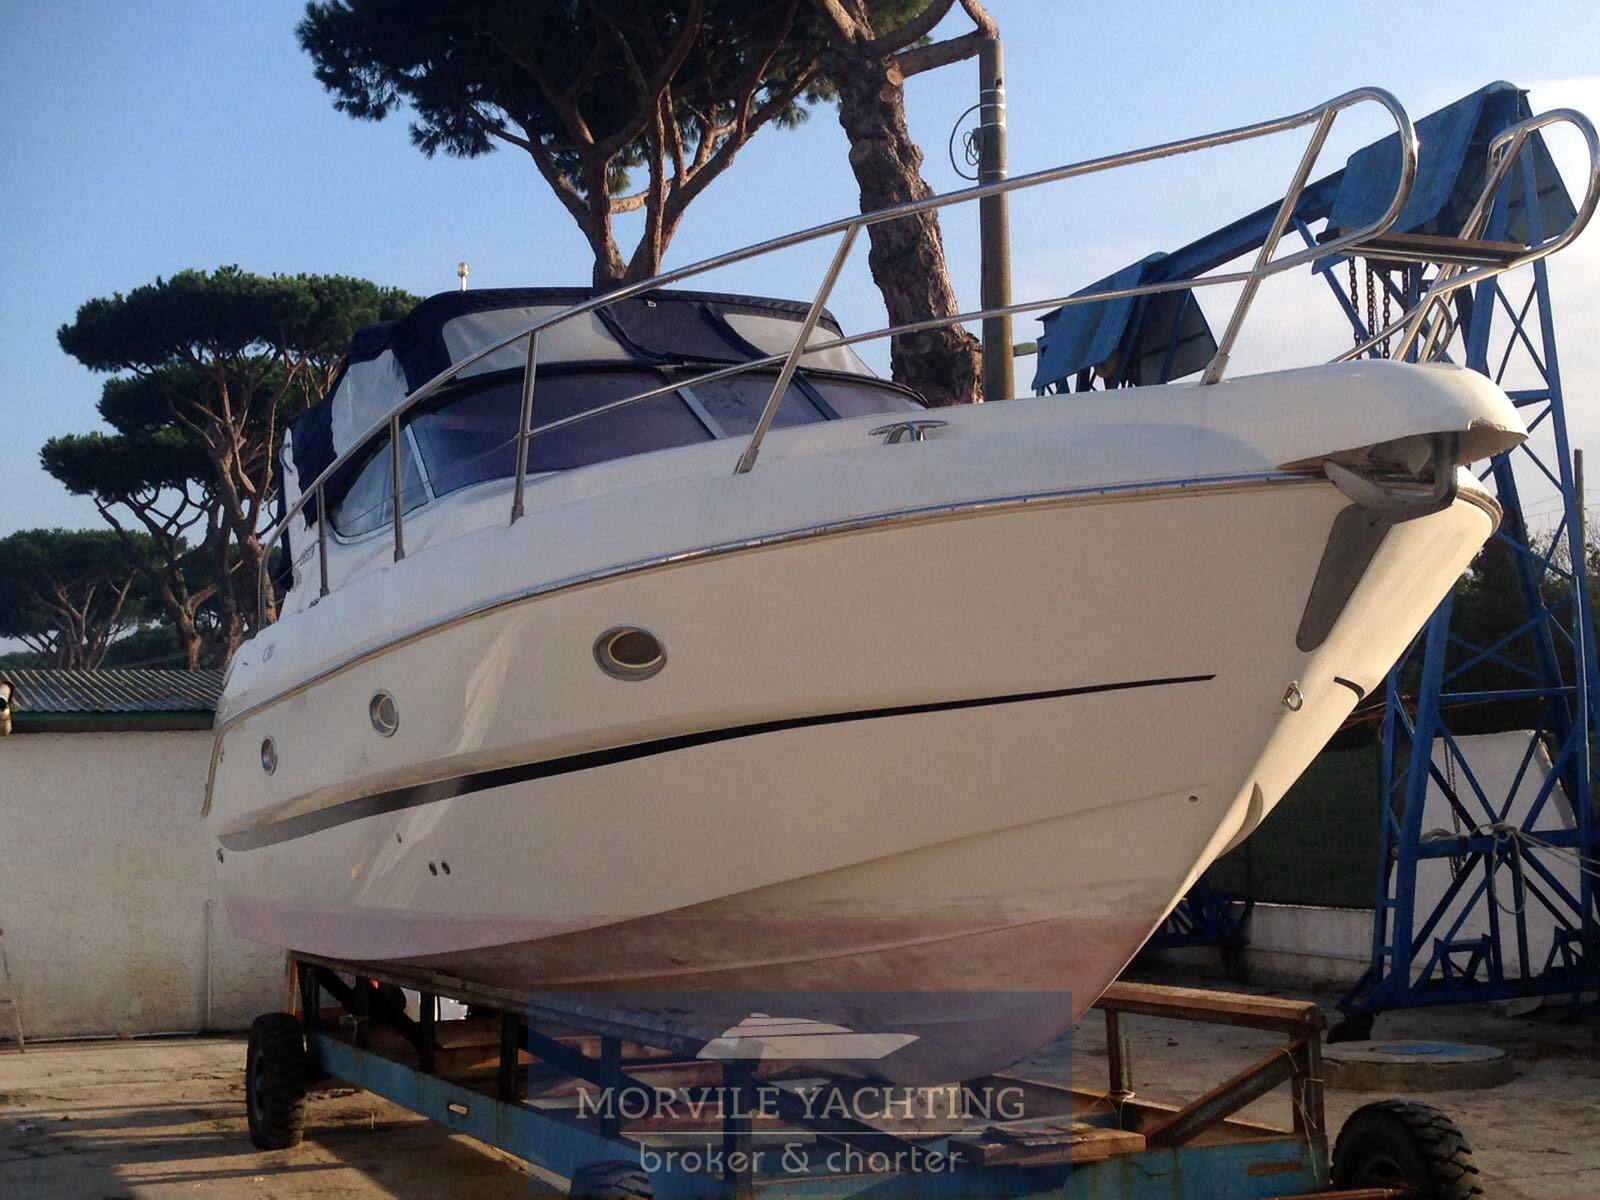 SESSA C 30 Motor boat used for sale